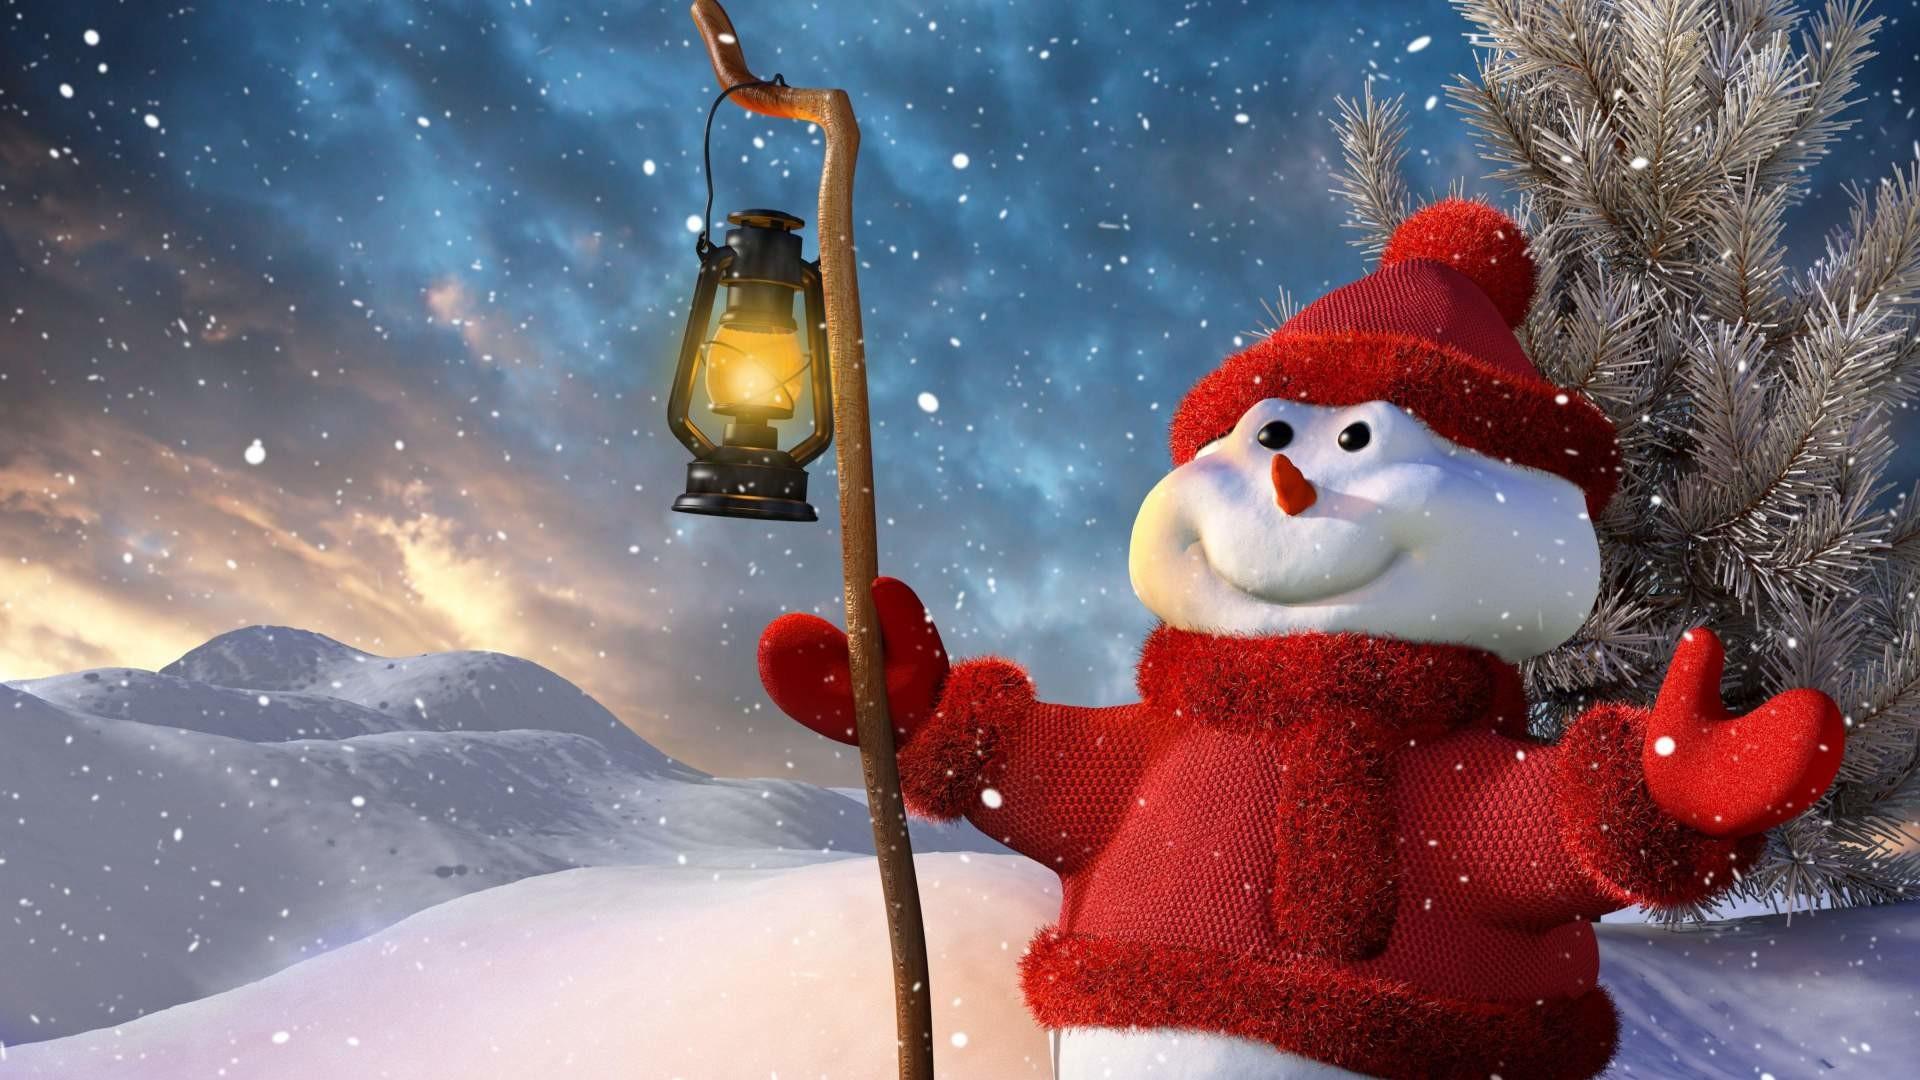 … Christmas Wallpaper 16 …